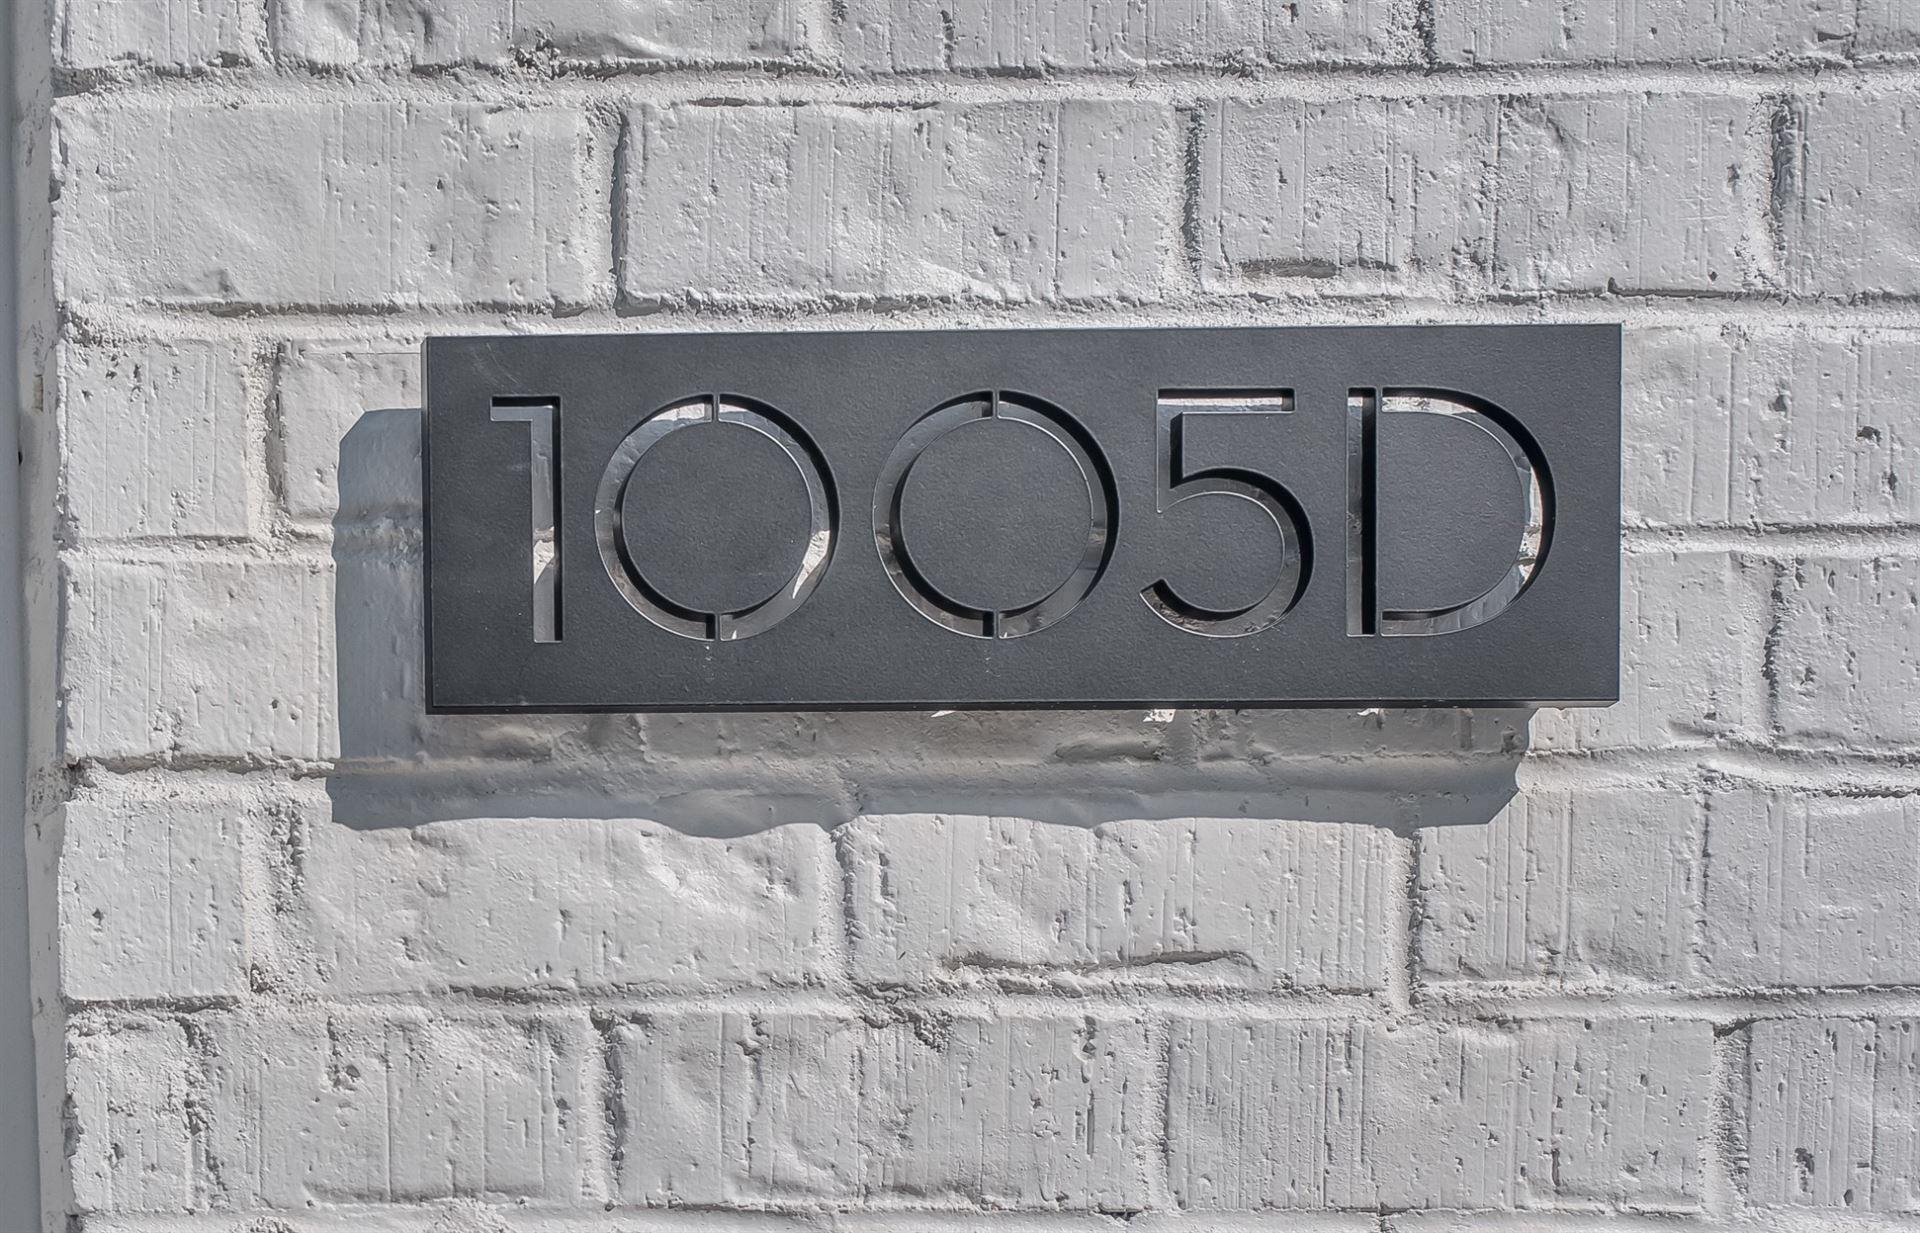 1005 12th Ave S #D, Nashville, TN 37203 - MLS#: 2207891